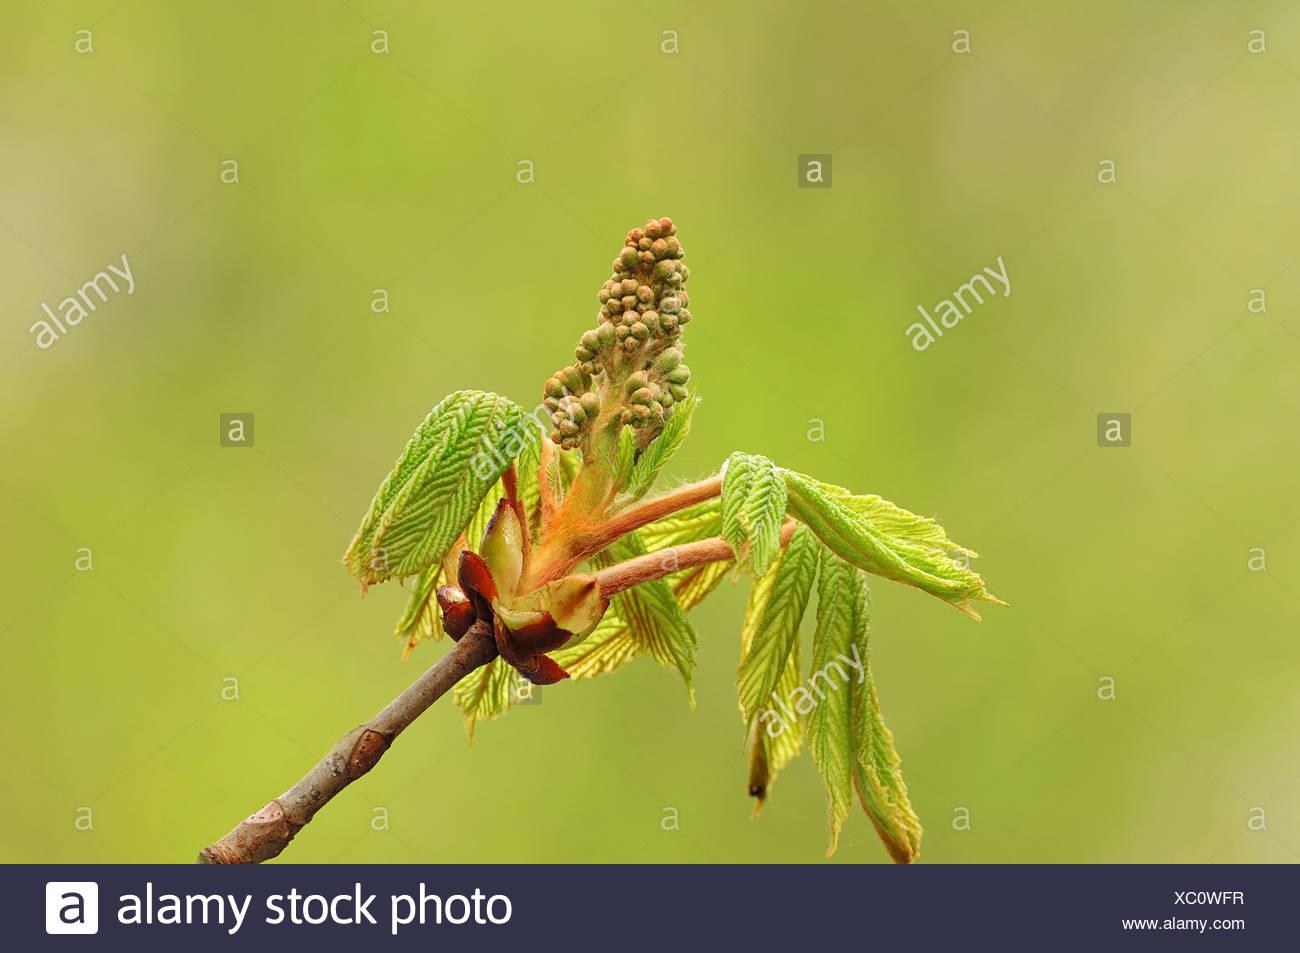 Horse Chestnut (Aesculus hippocastanum), leaves and flower buds, North Rhine-Westphalia Stock Photo